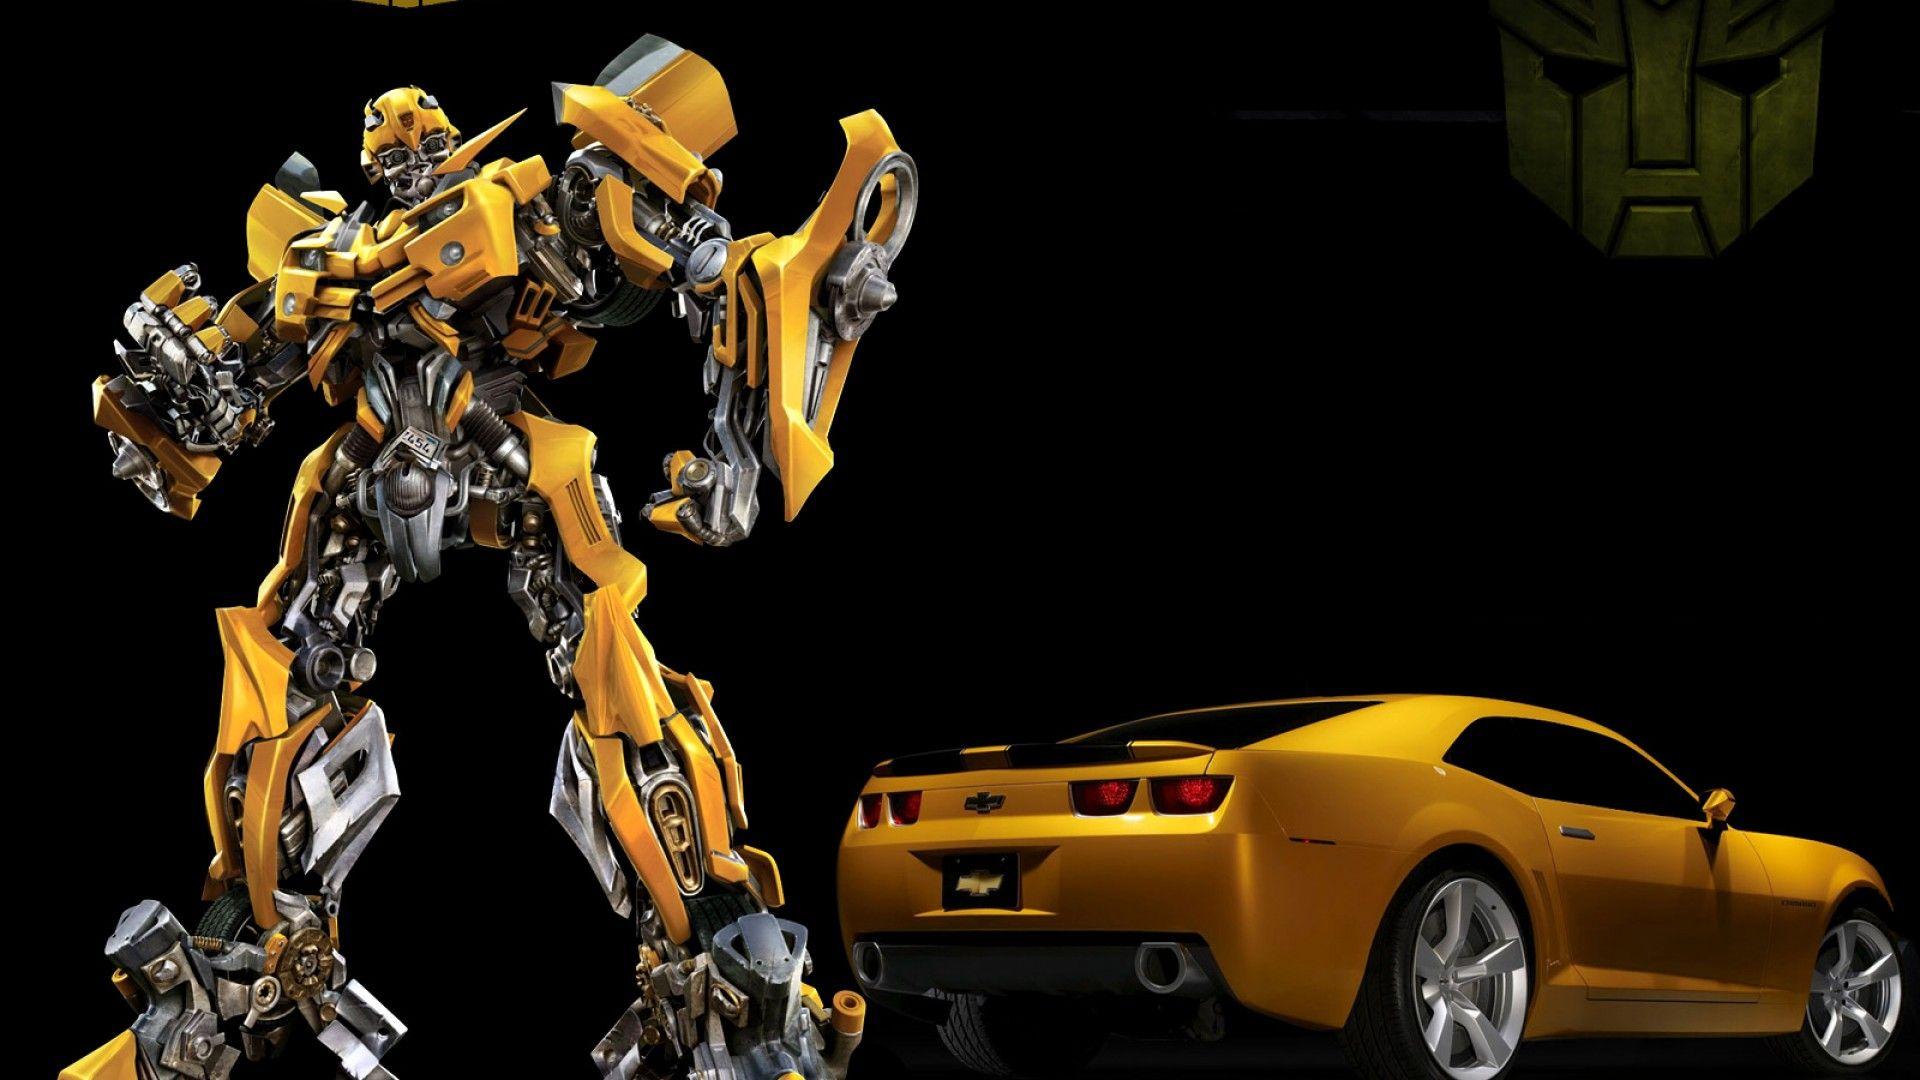 chevrolet camaro transformers Wallpaper Transformers